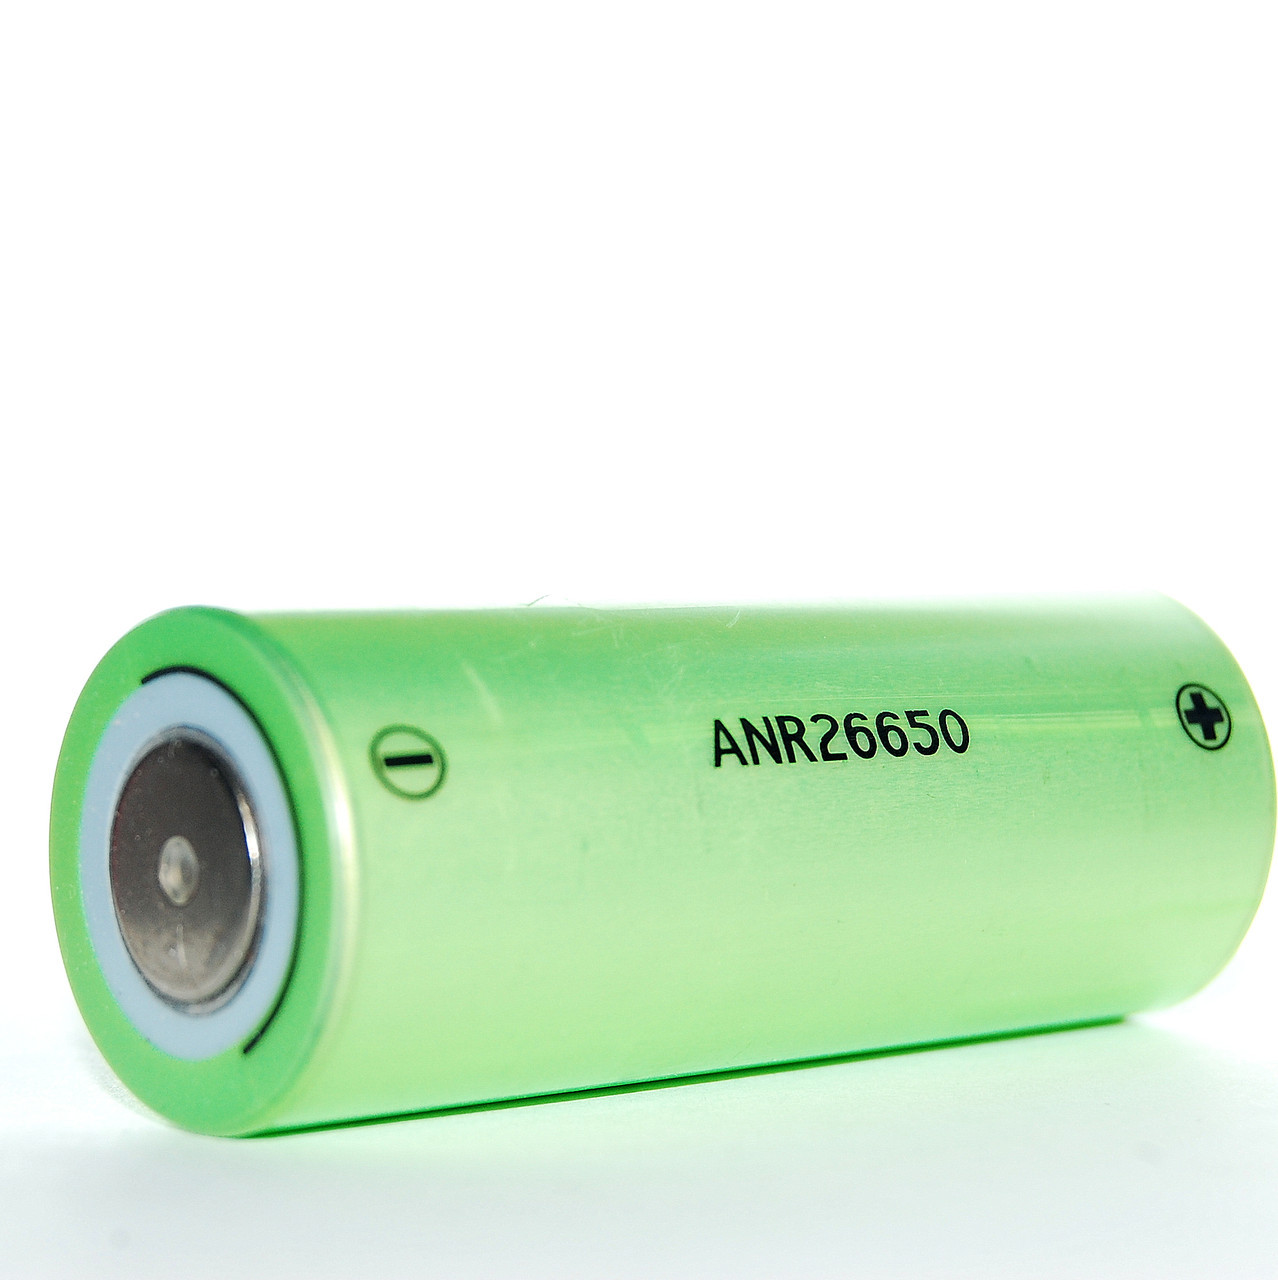 Акумулятор ANR26650 2500 мА/г, LiFePO4